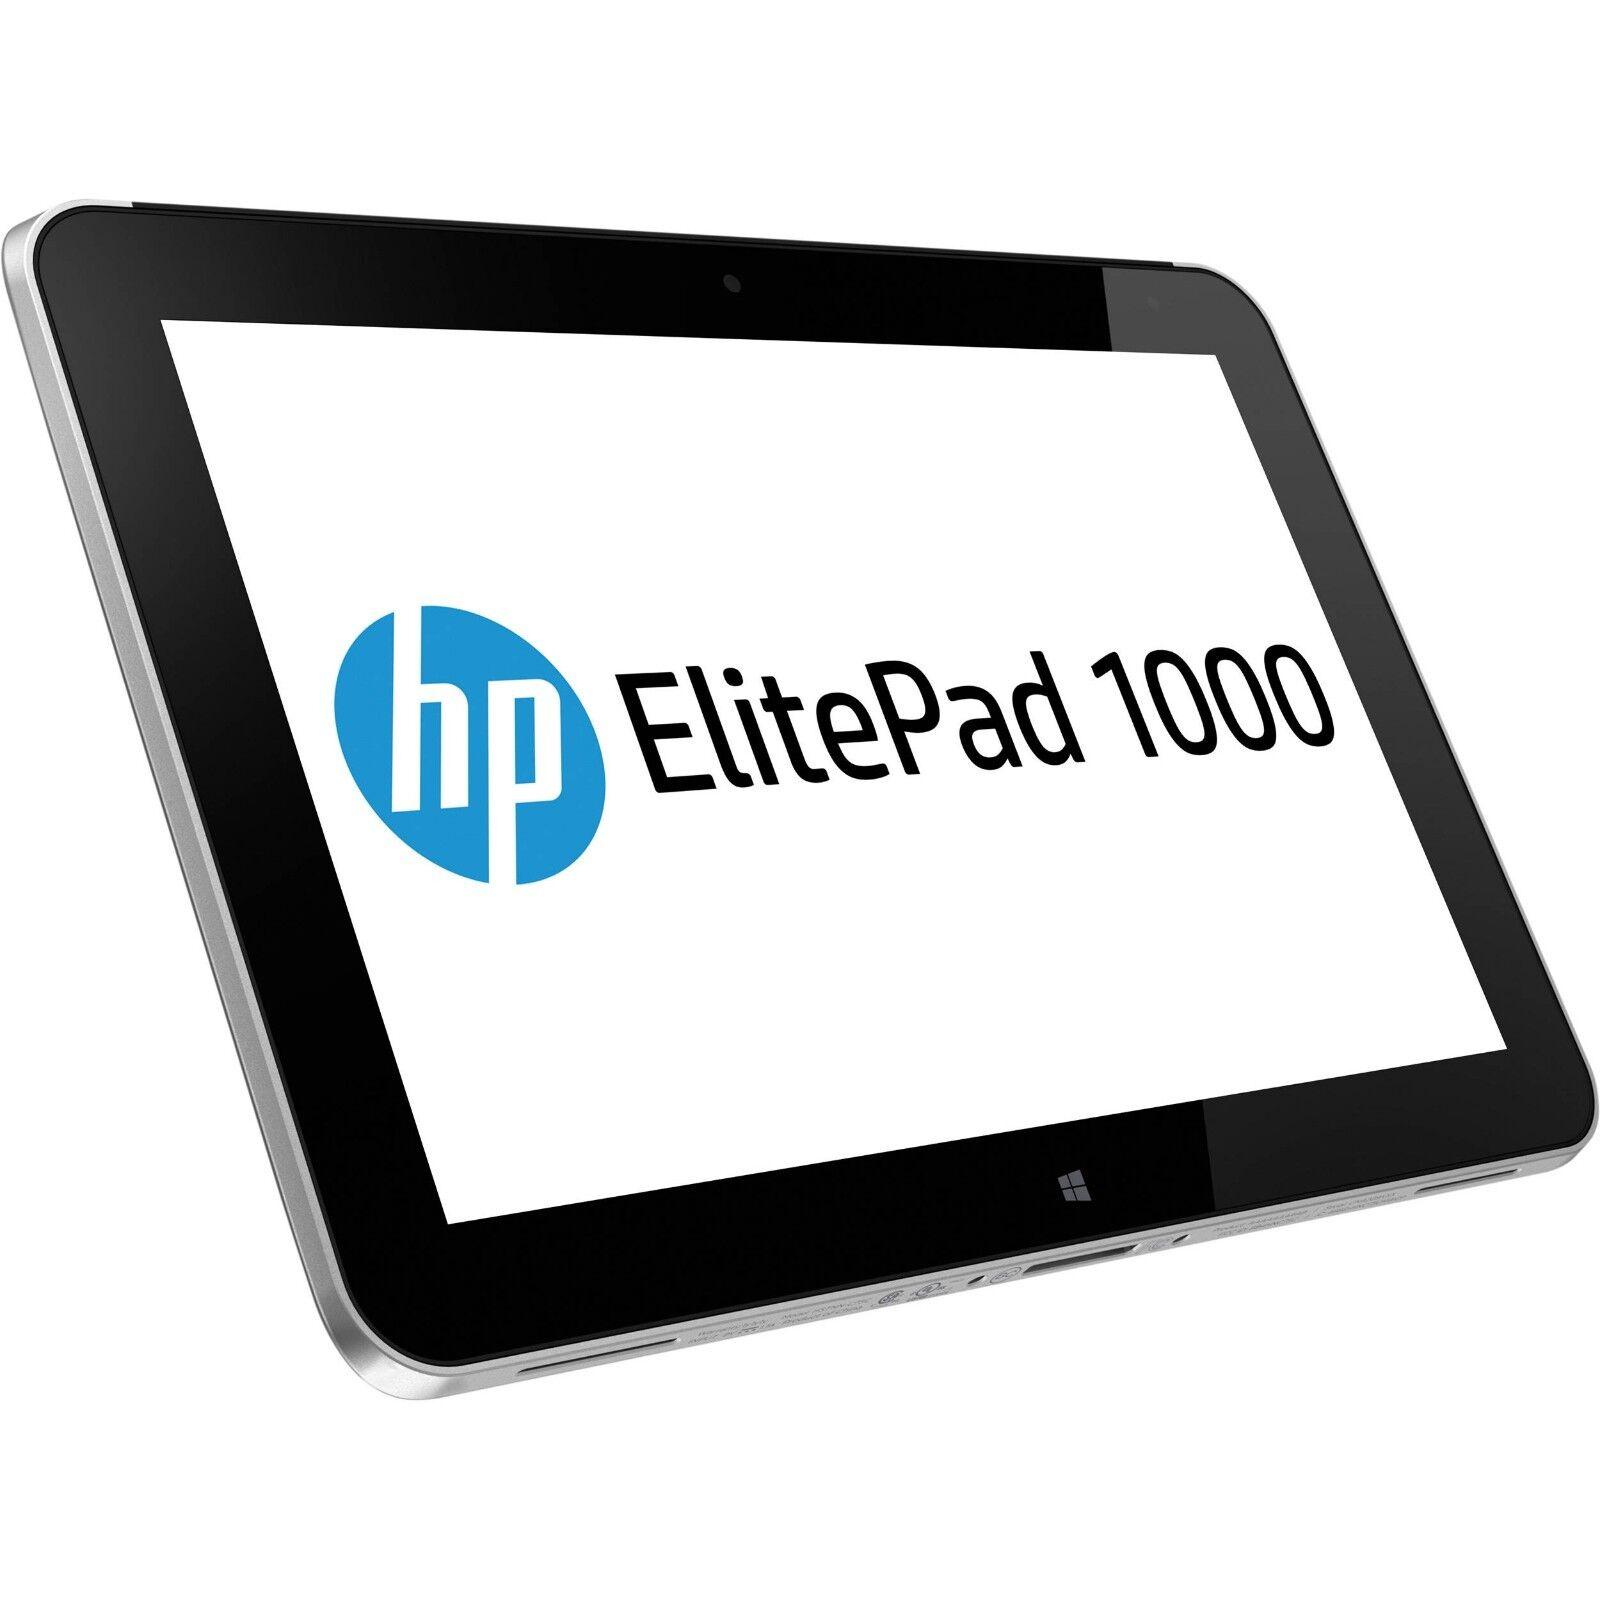 "HP ELITEPAD 1000 G2 TABLET Z3795 1.6GHz 4GB 64GB HDZ3700 10.1"" NO OS"